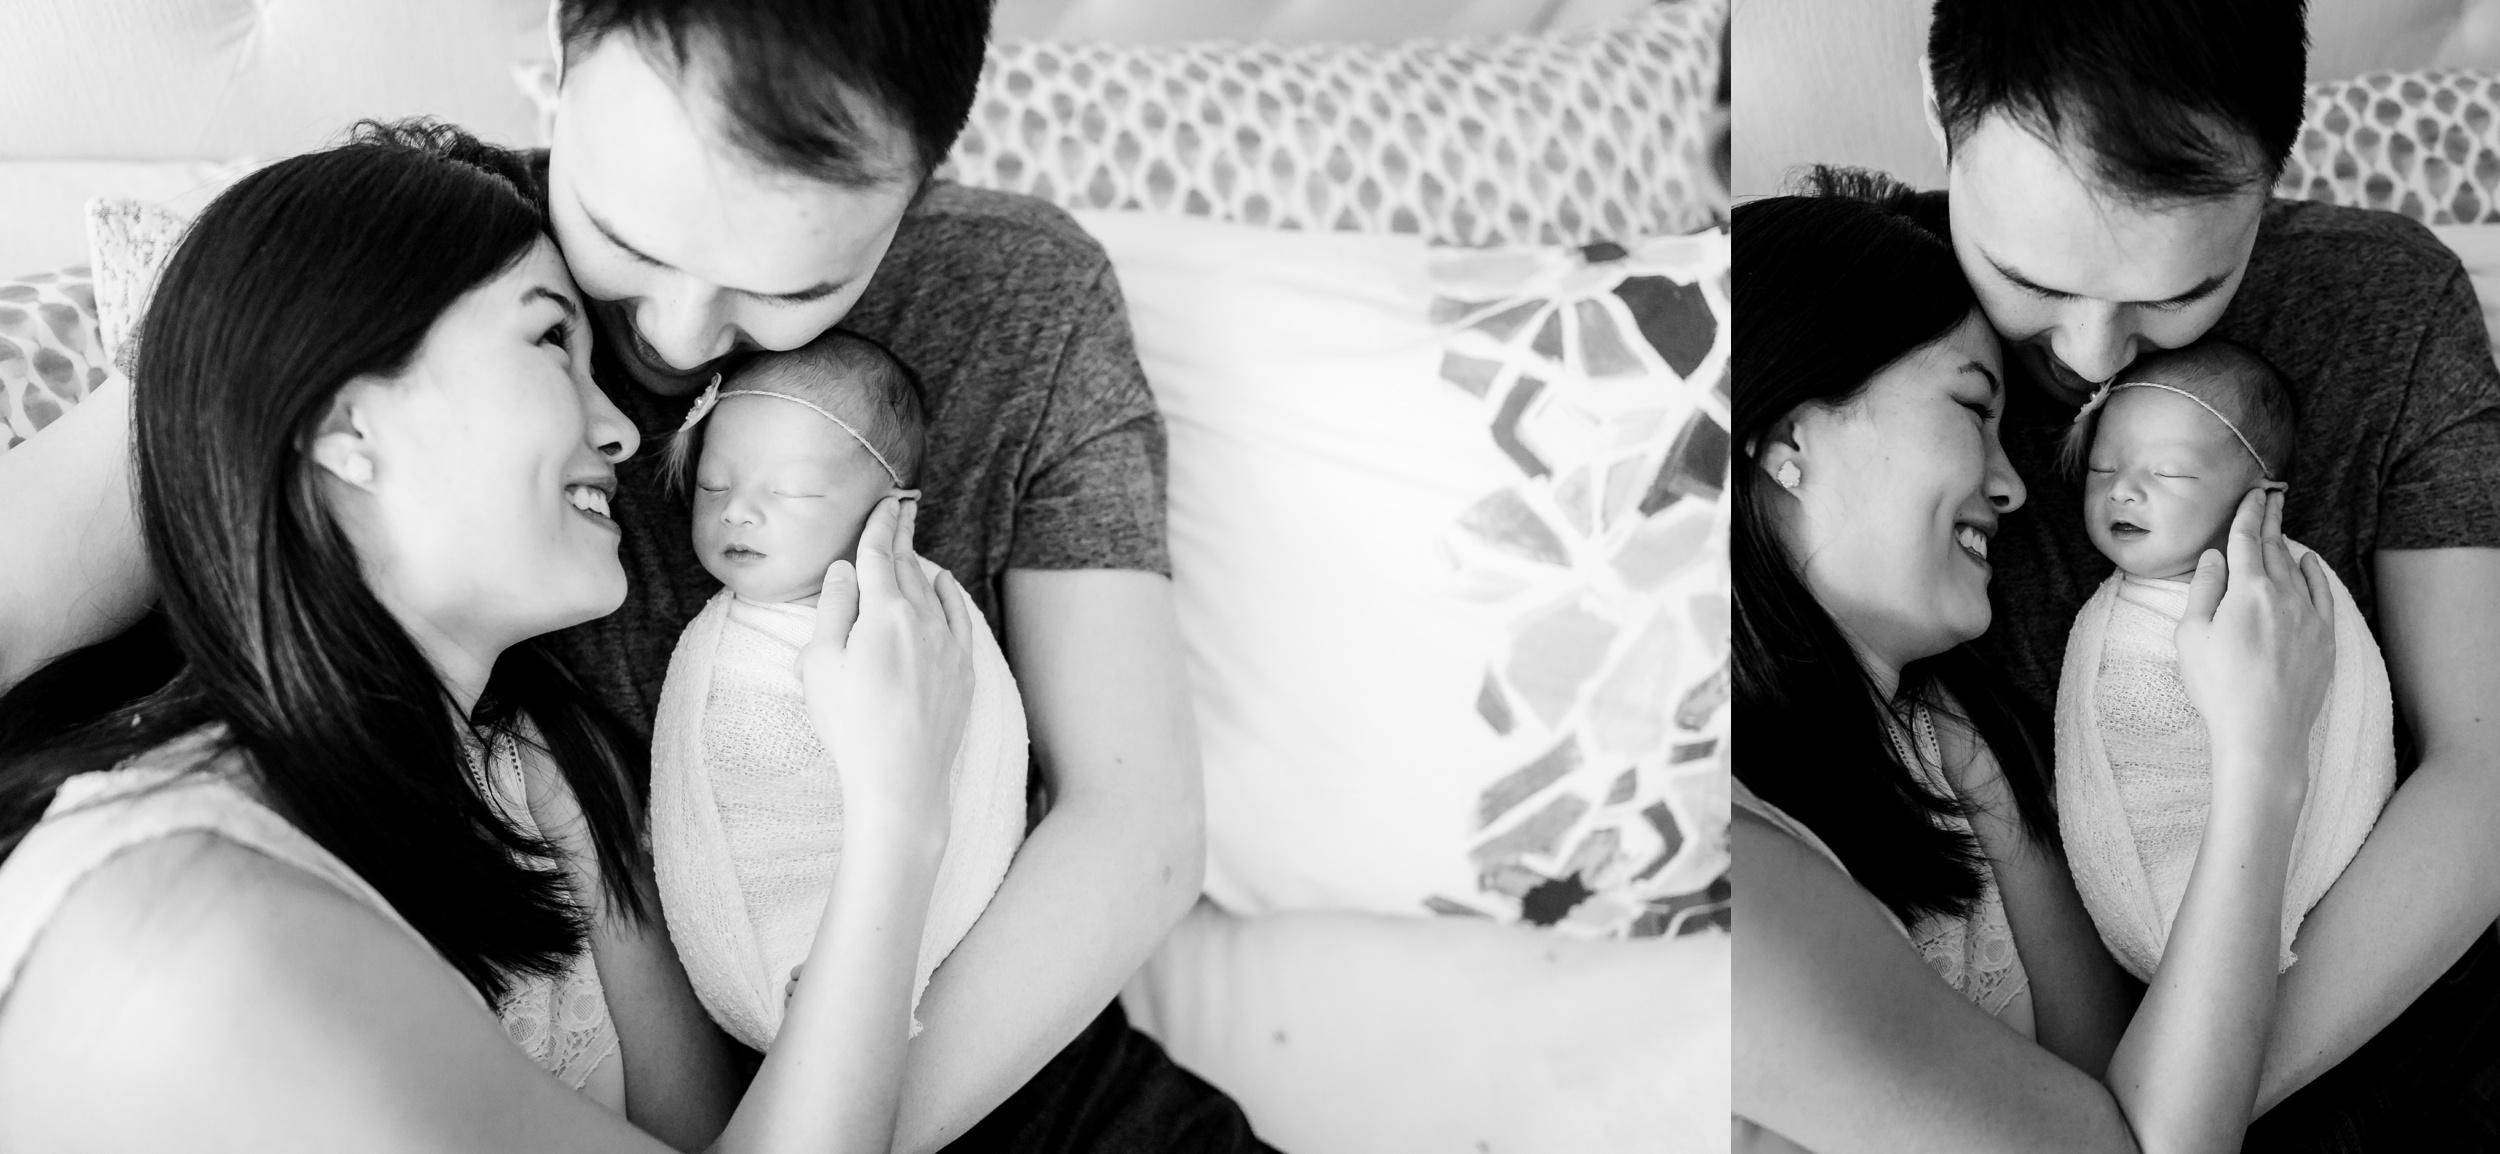 chicago-newborn-family-lifestyle-photographer-jenny-grimm-photography_0003.jpg